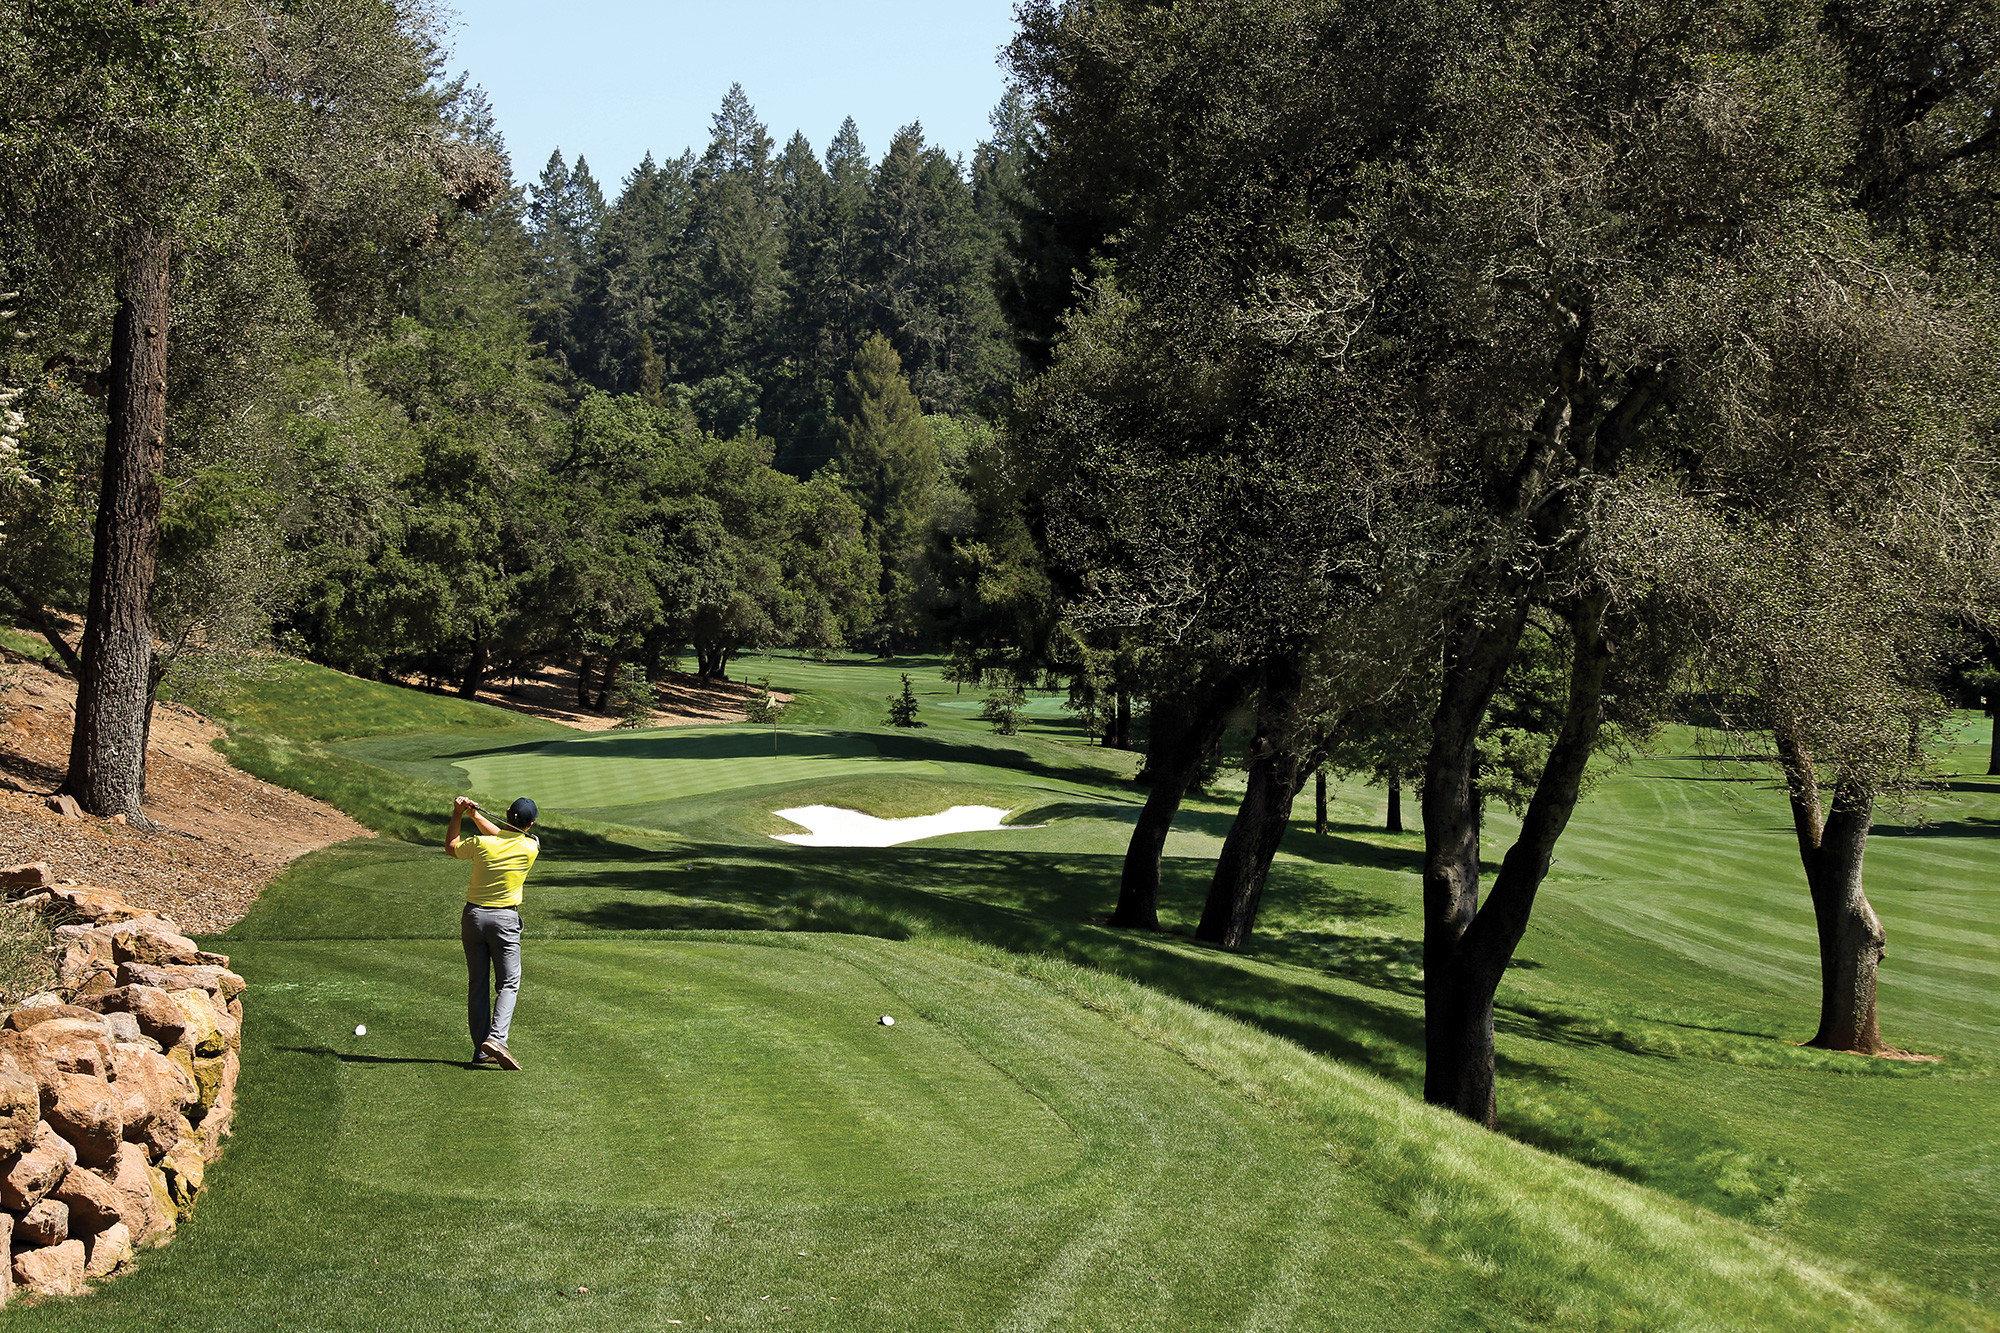 Hotels tree grass outdoor golf course golf club field Golf landscape plant recreation lawn plantation golf equipment lush